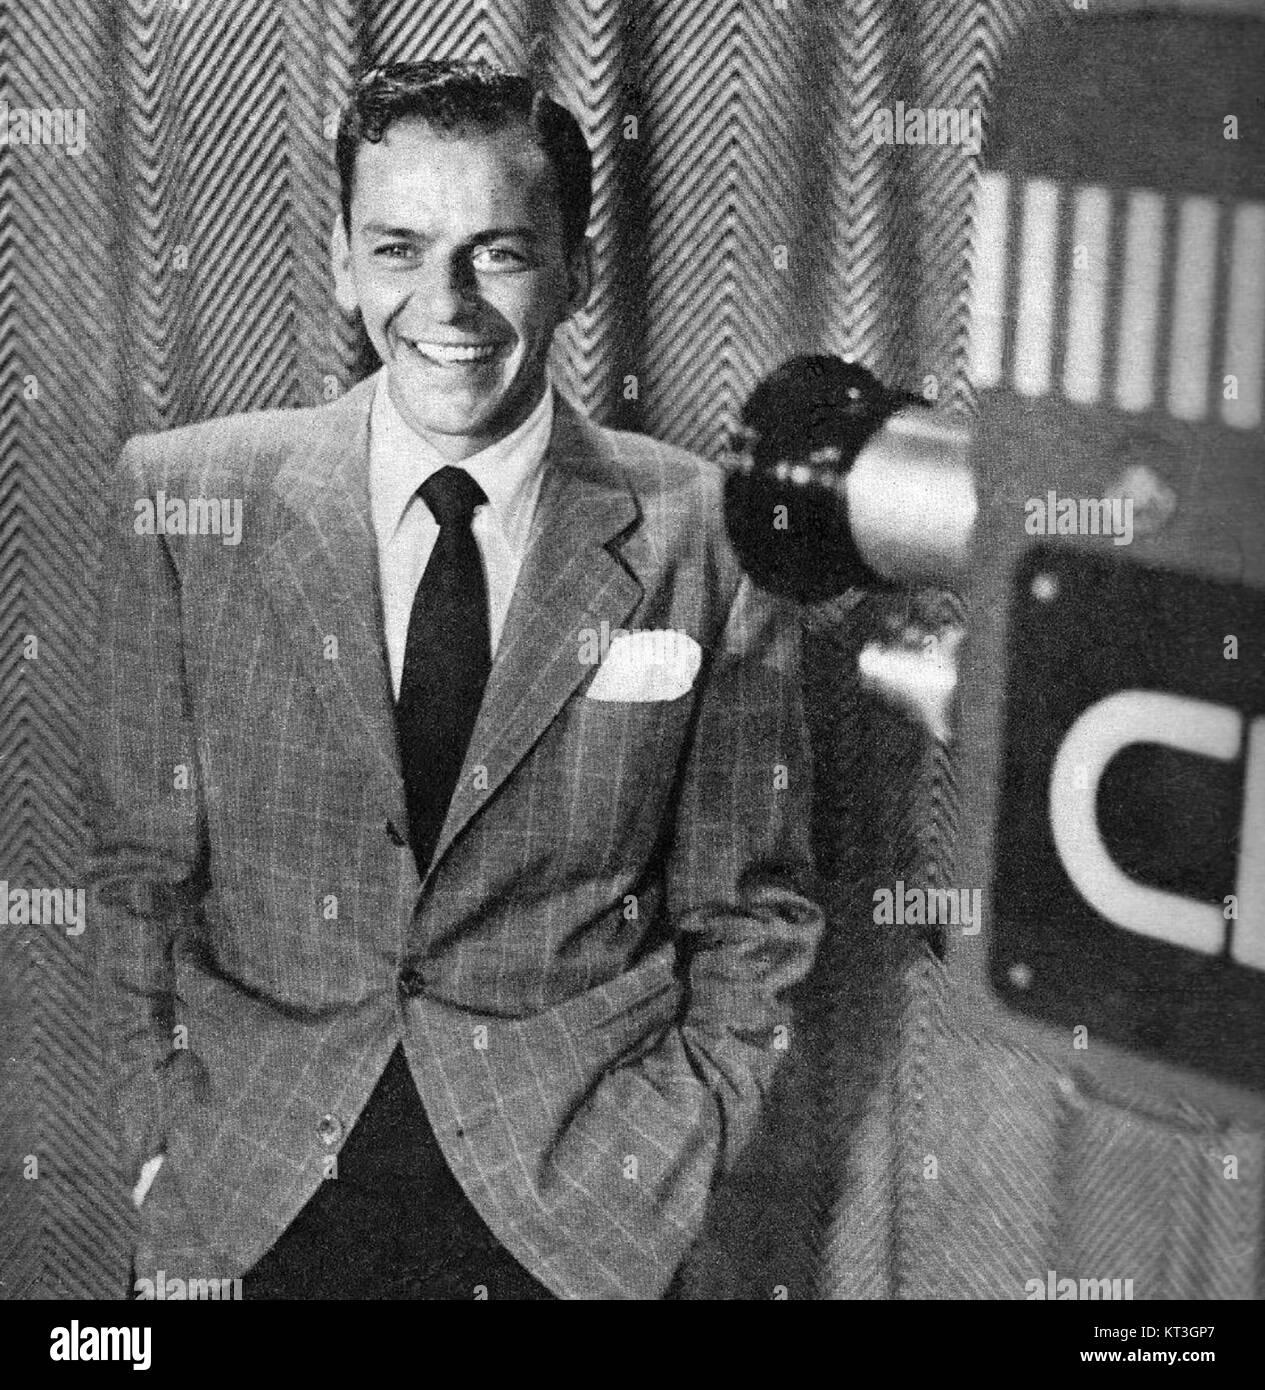 Frank Sinatra Metronome magazine November 1950 - Stock Image